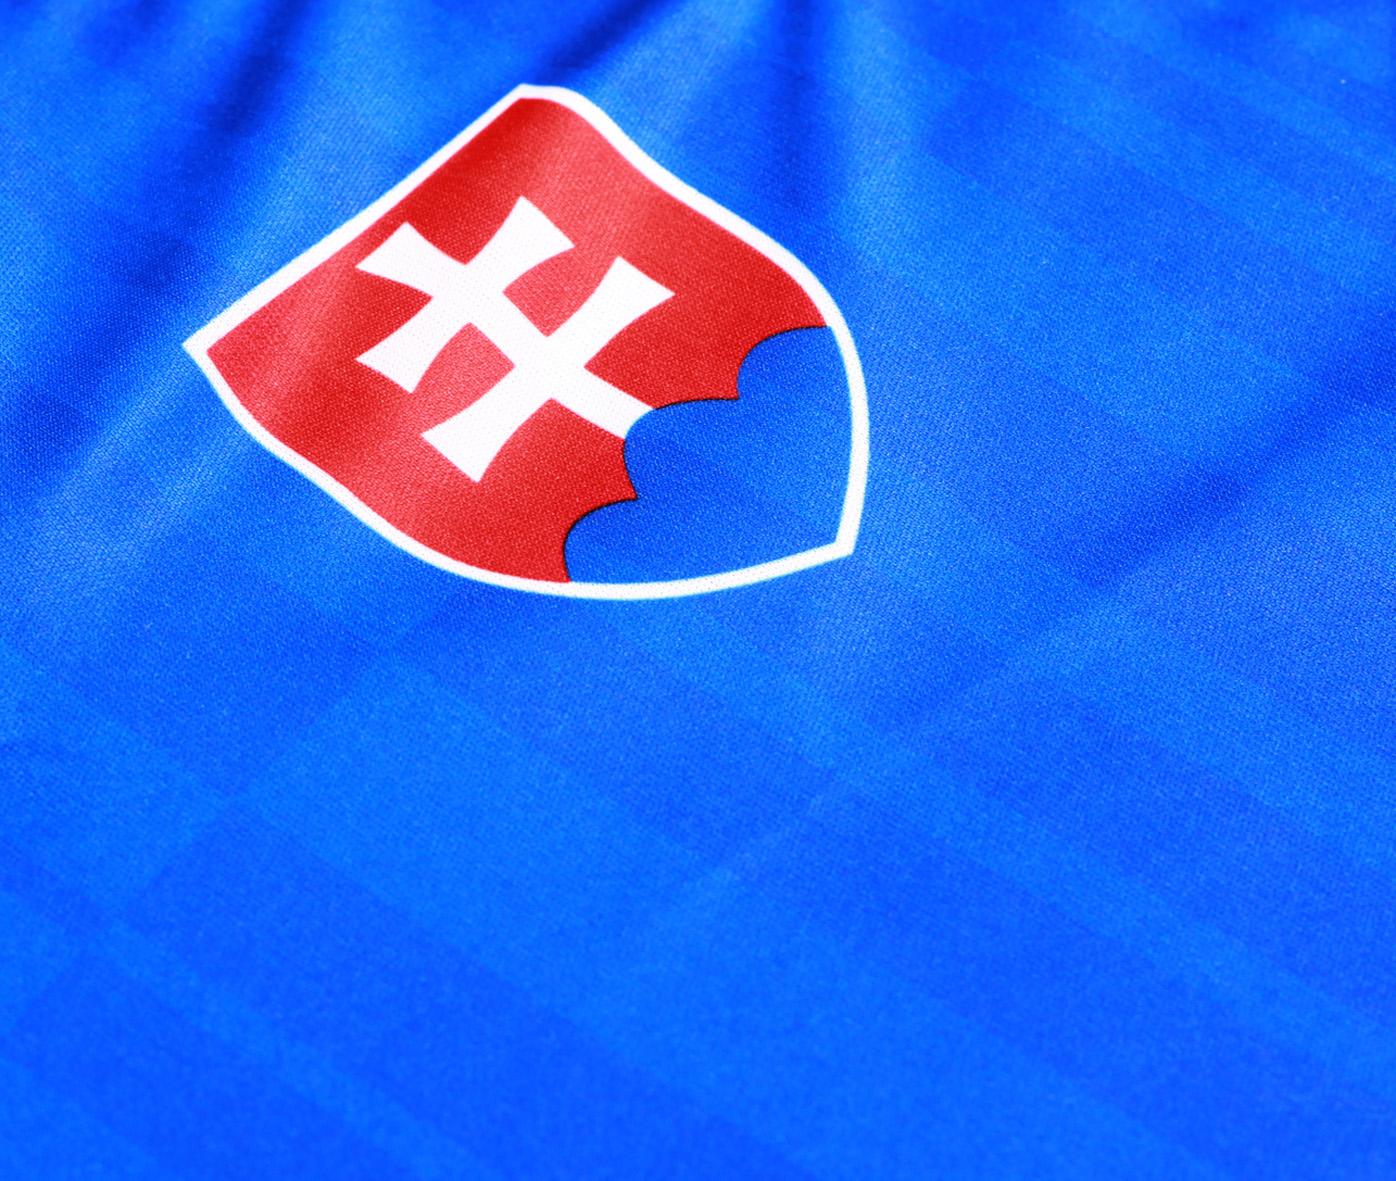 b0afaea37f168 DRESY - SLOVAKIA SLOVENSKO | detské reprezent. futbal. trenírky ...